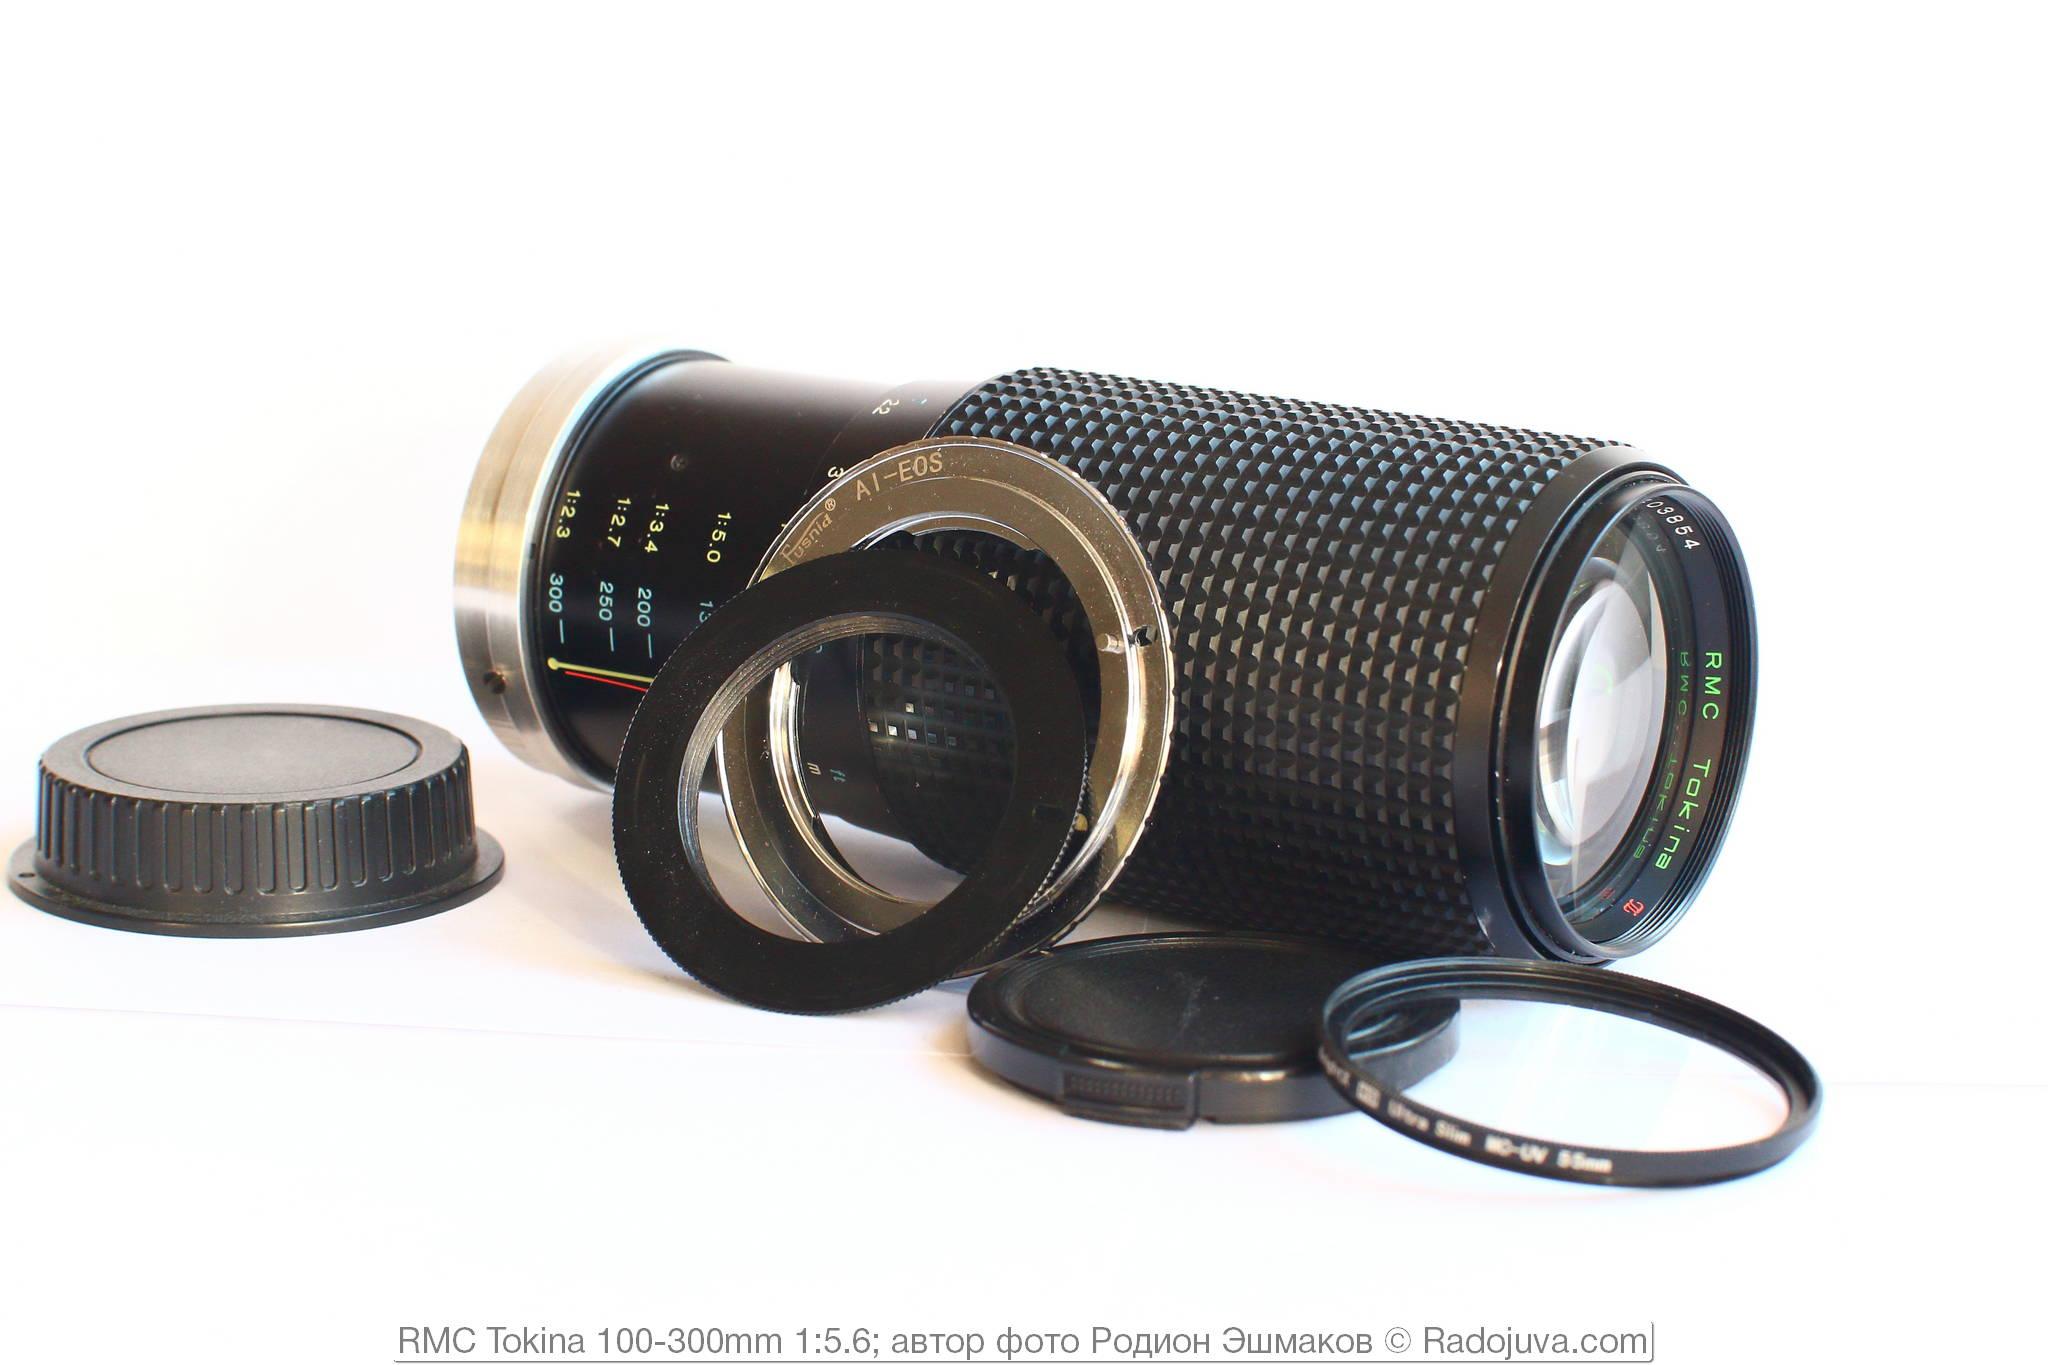 RMC Tokina 100-300mm 1:5.6